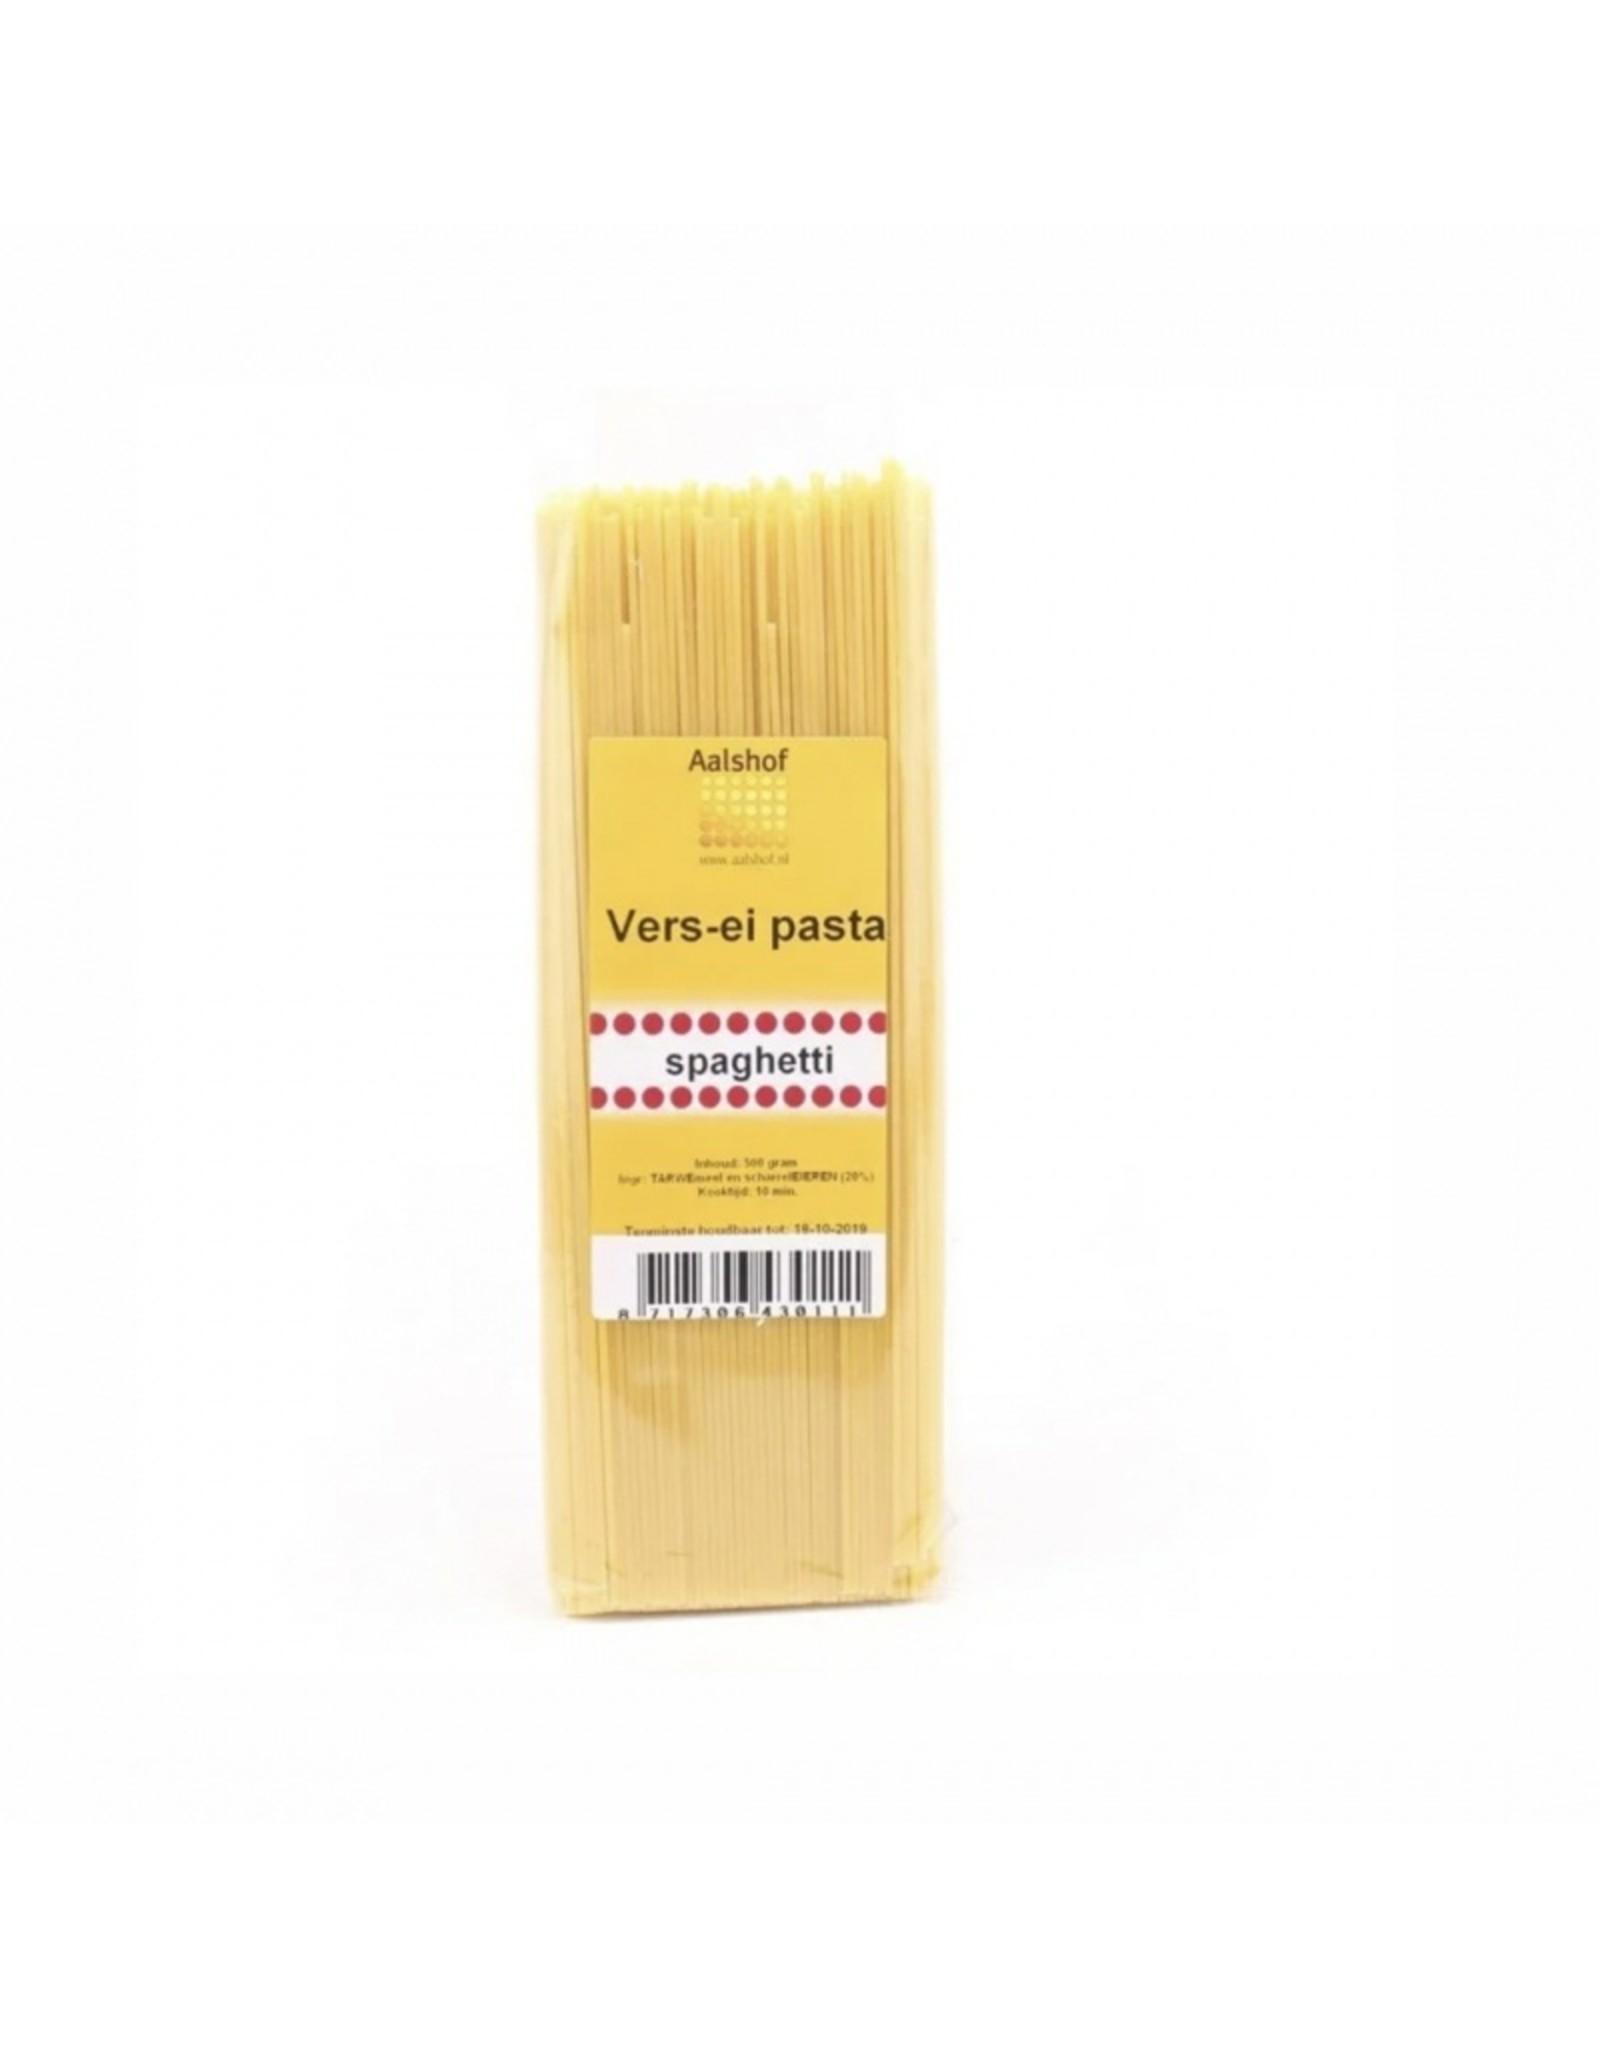 Vers-ei pasta spaghetti 500 gr